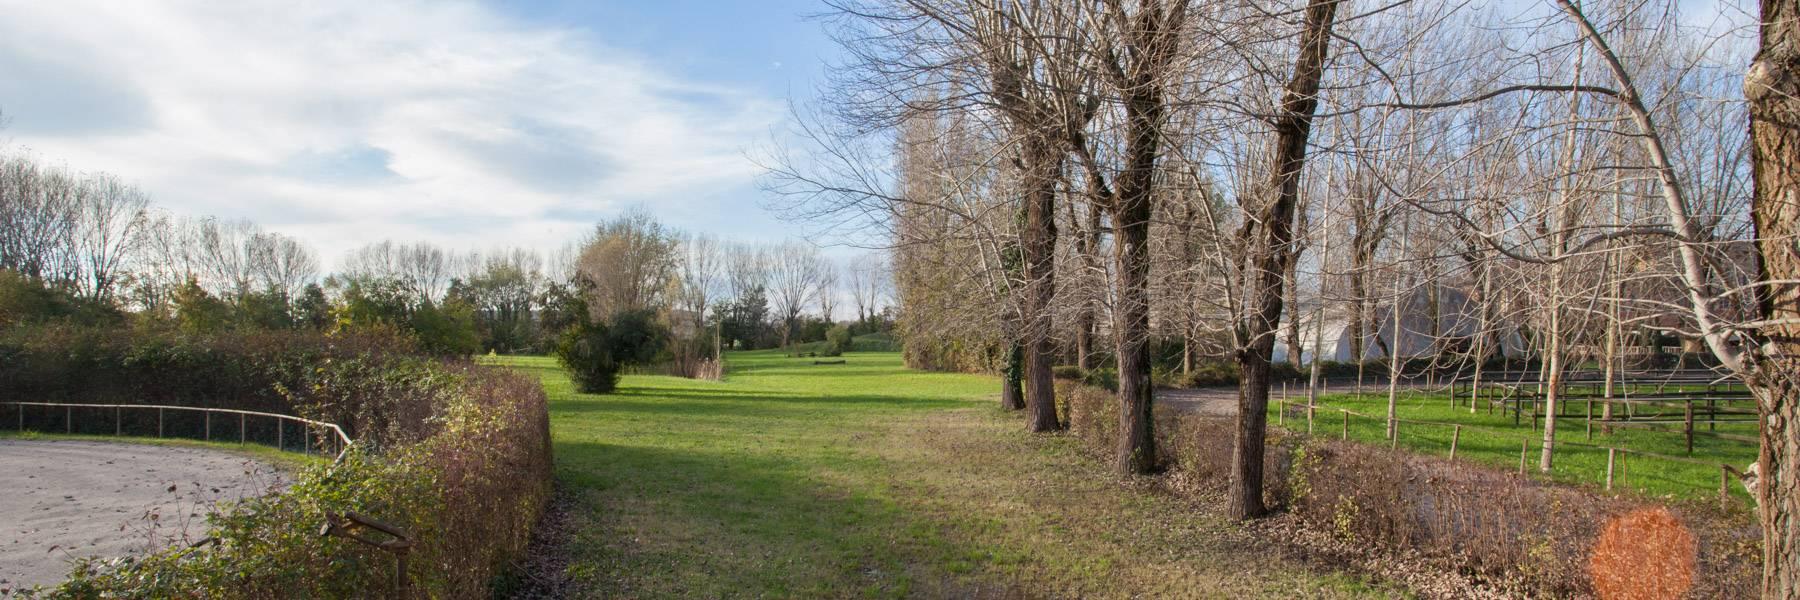 Parco Scuola Padovana